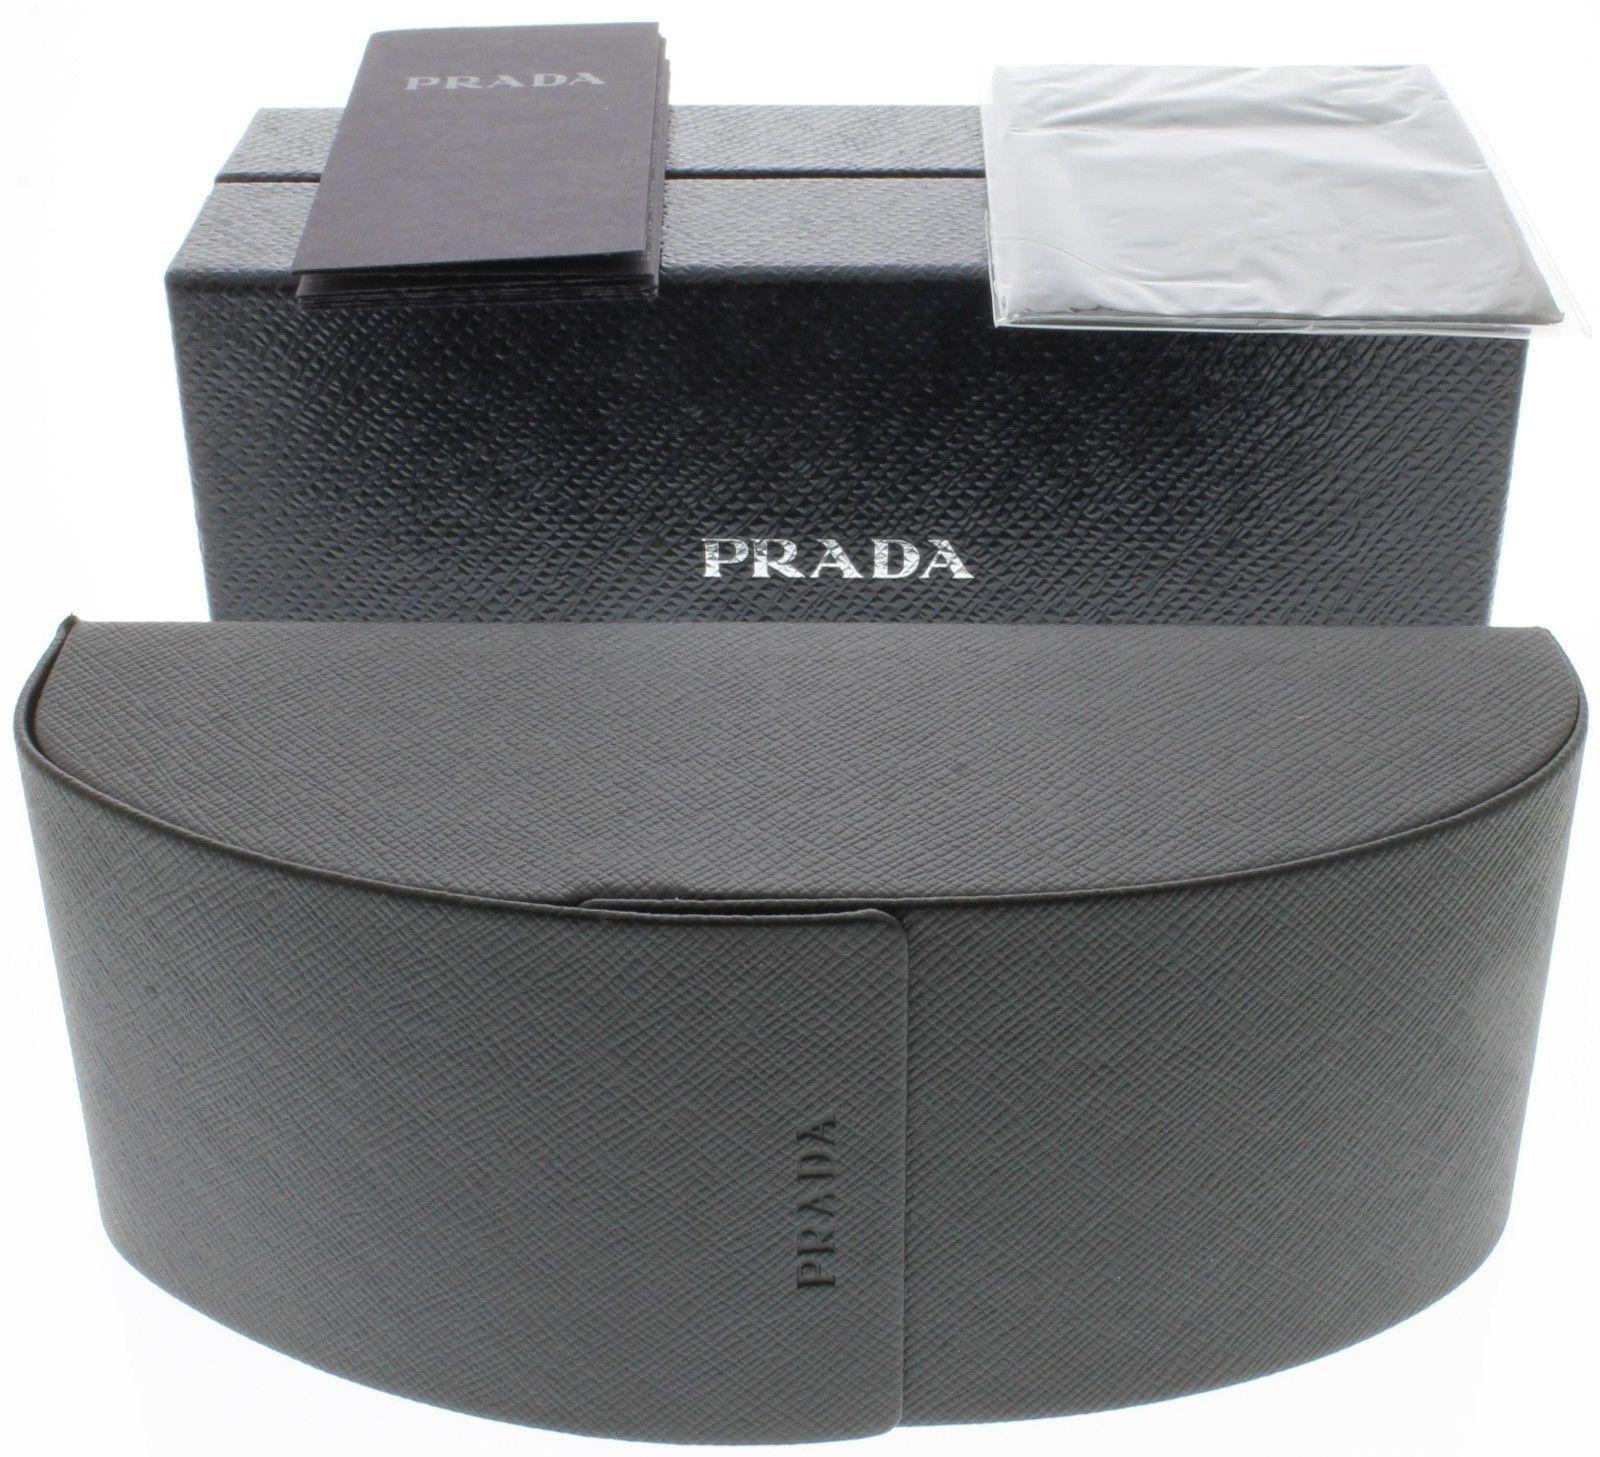 Prada Sunglasses Women Off White With Stud Detailing Cateye PR31QS 7S30A7